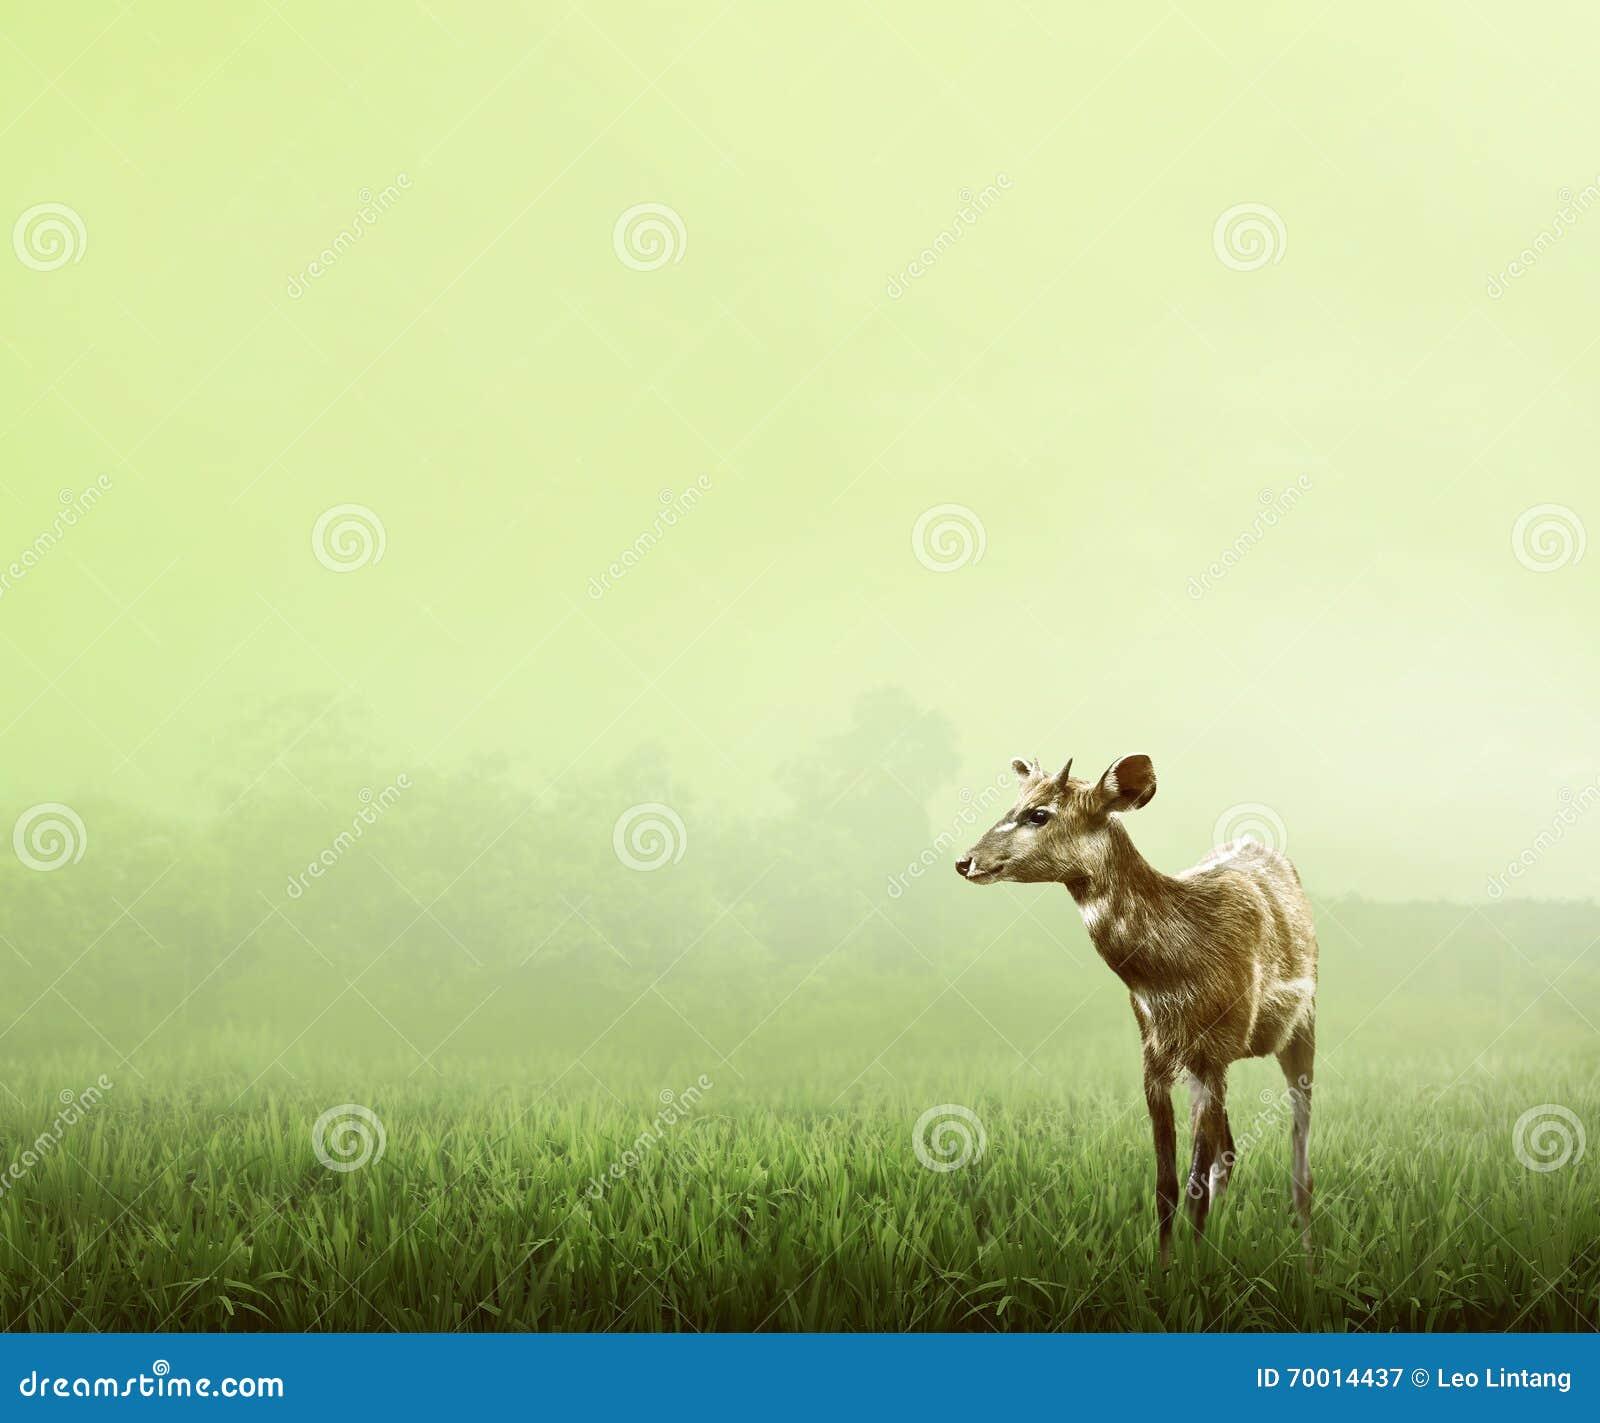 deer single women Discover single women in red deer online at interracial dating central interested in seeking good looking women somewhere in red deer meeting women in red deer has never been easier.